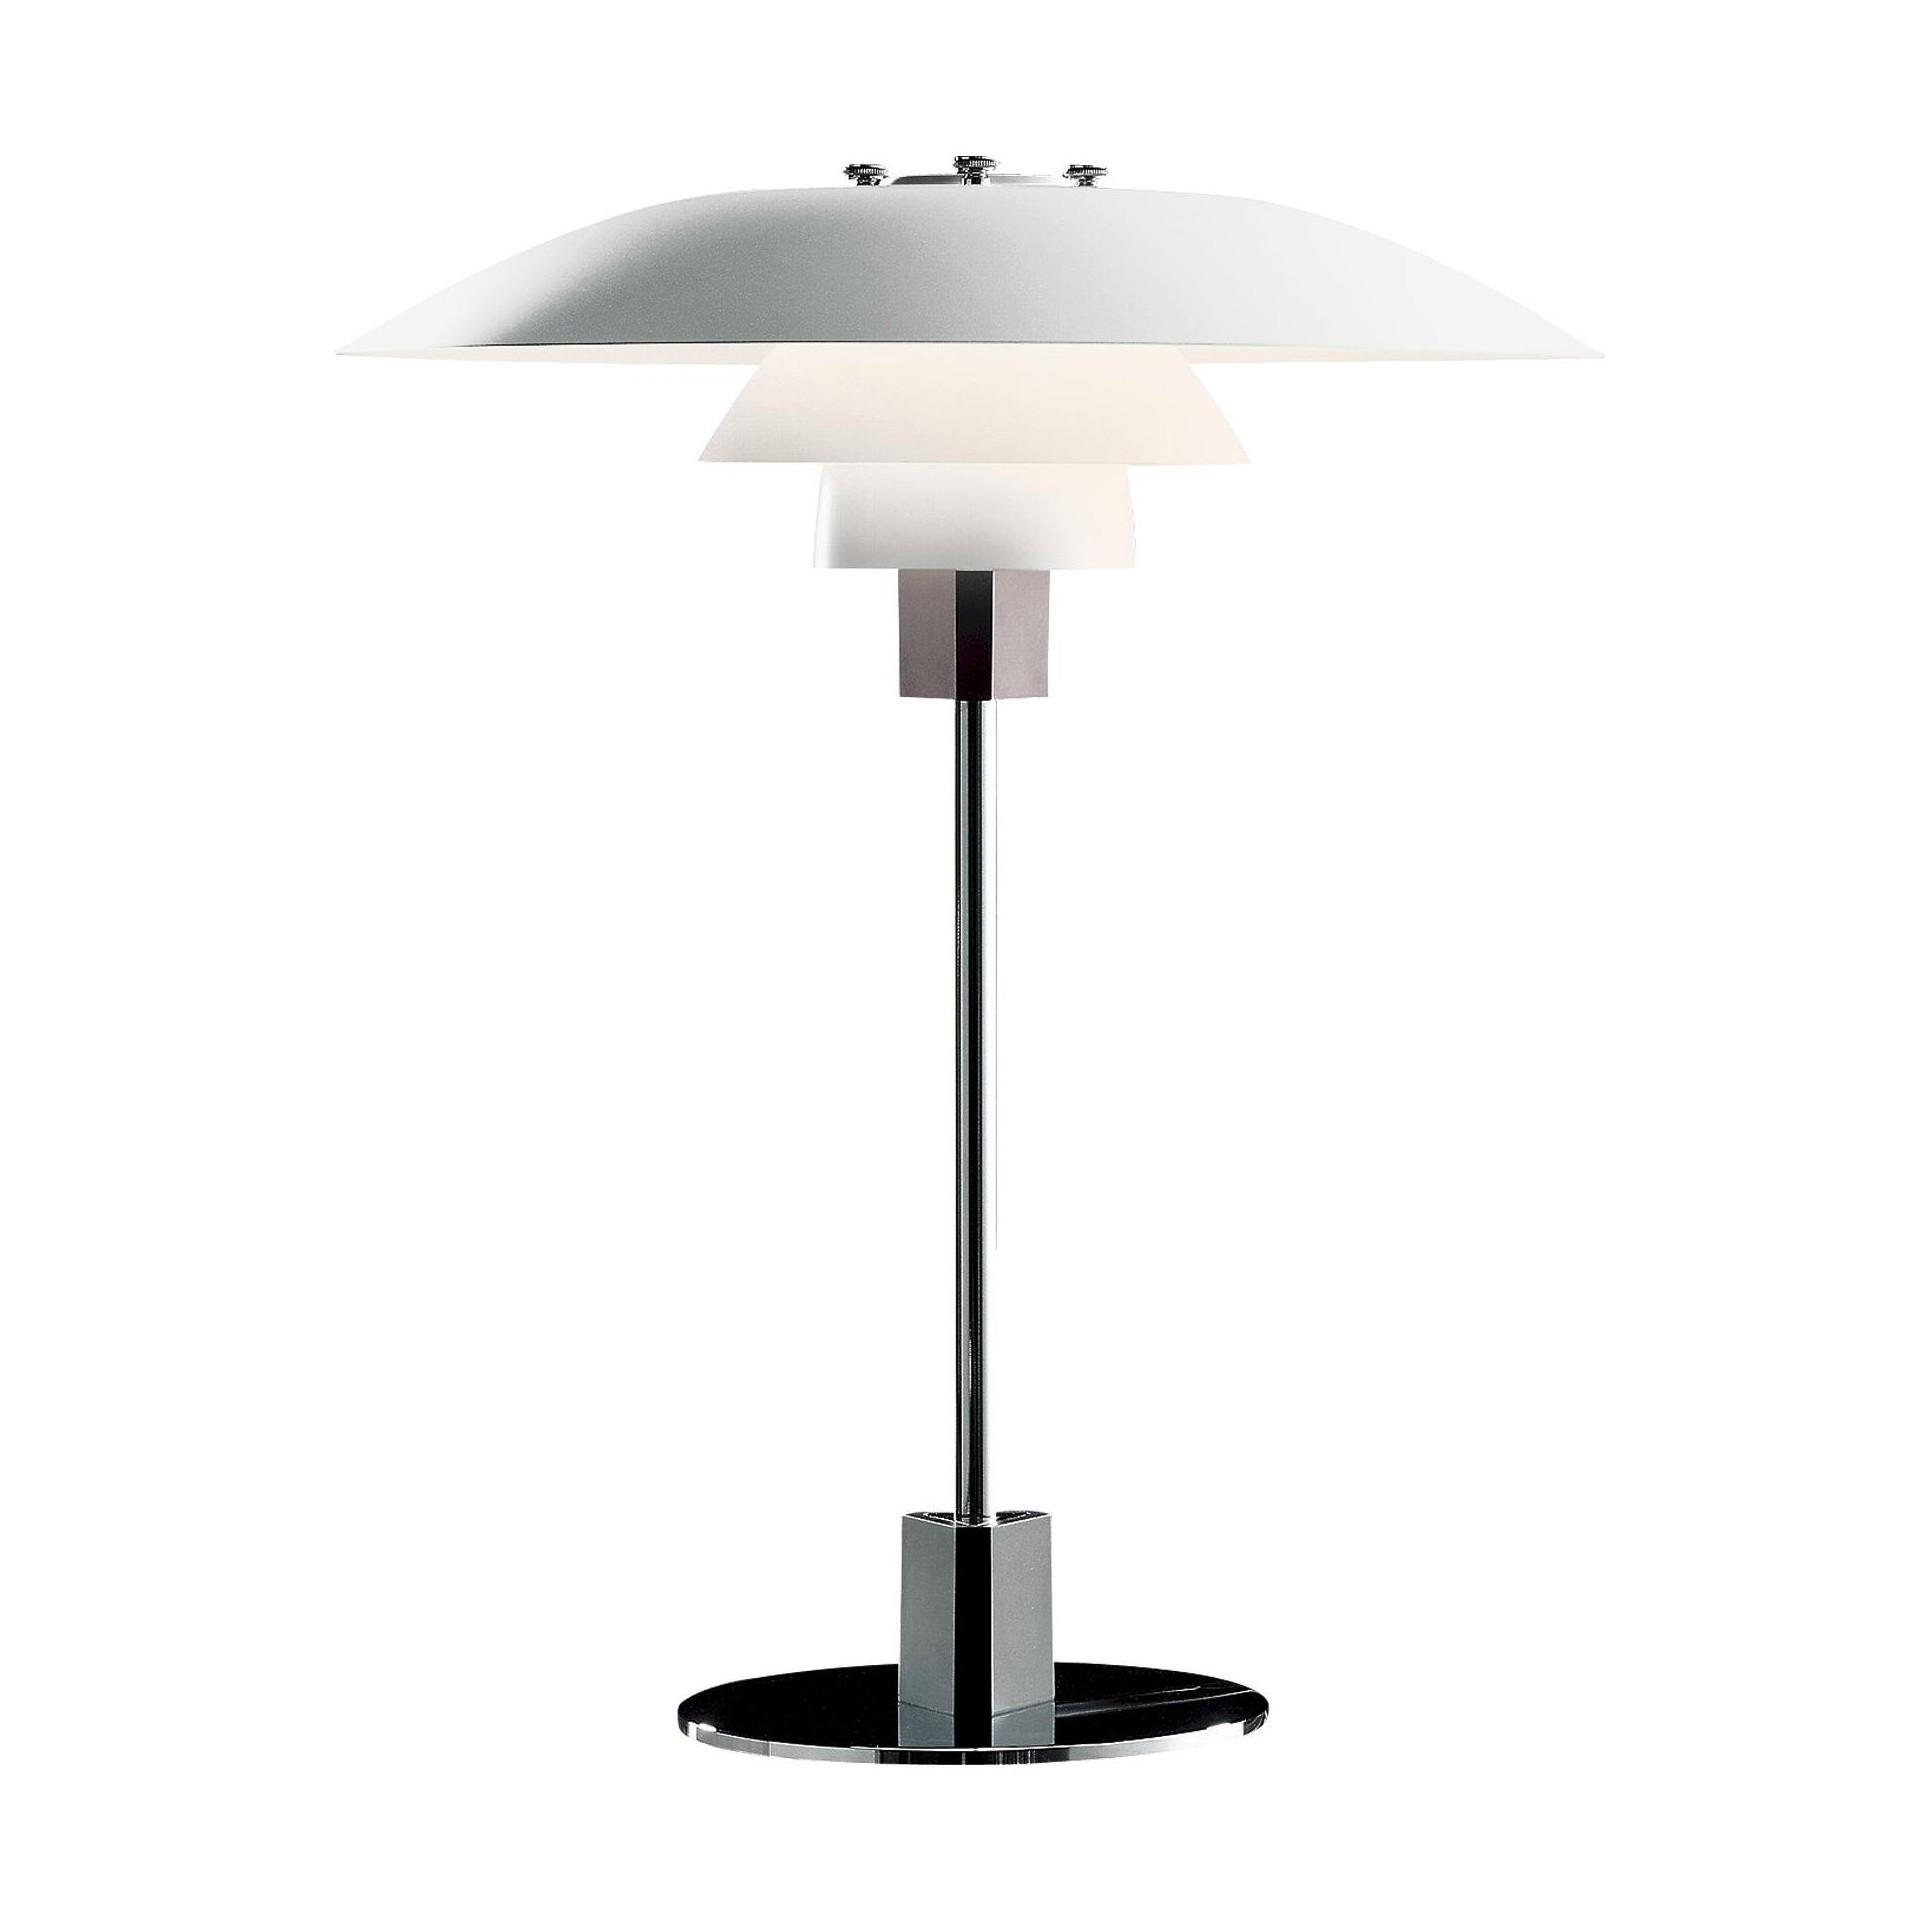 ph 4 3 table lamp